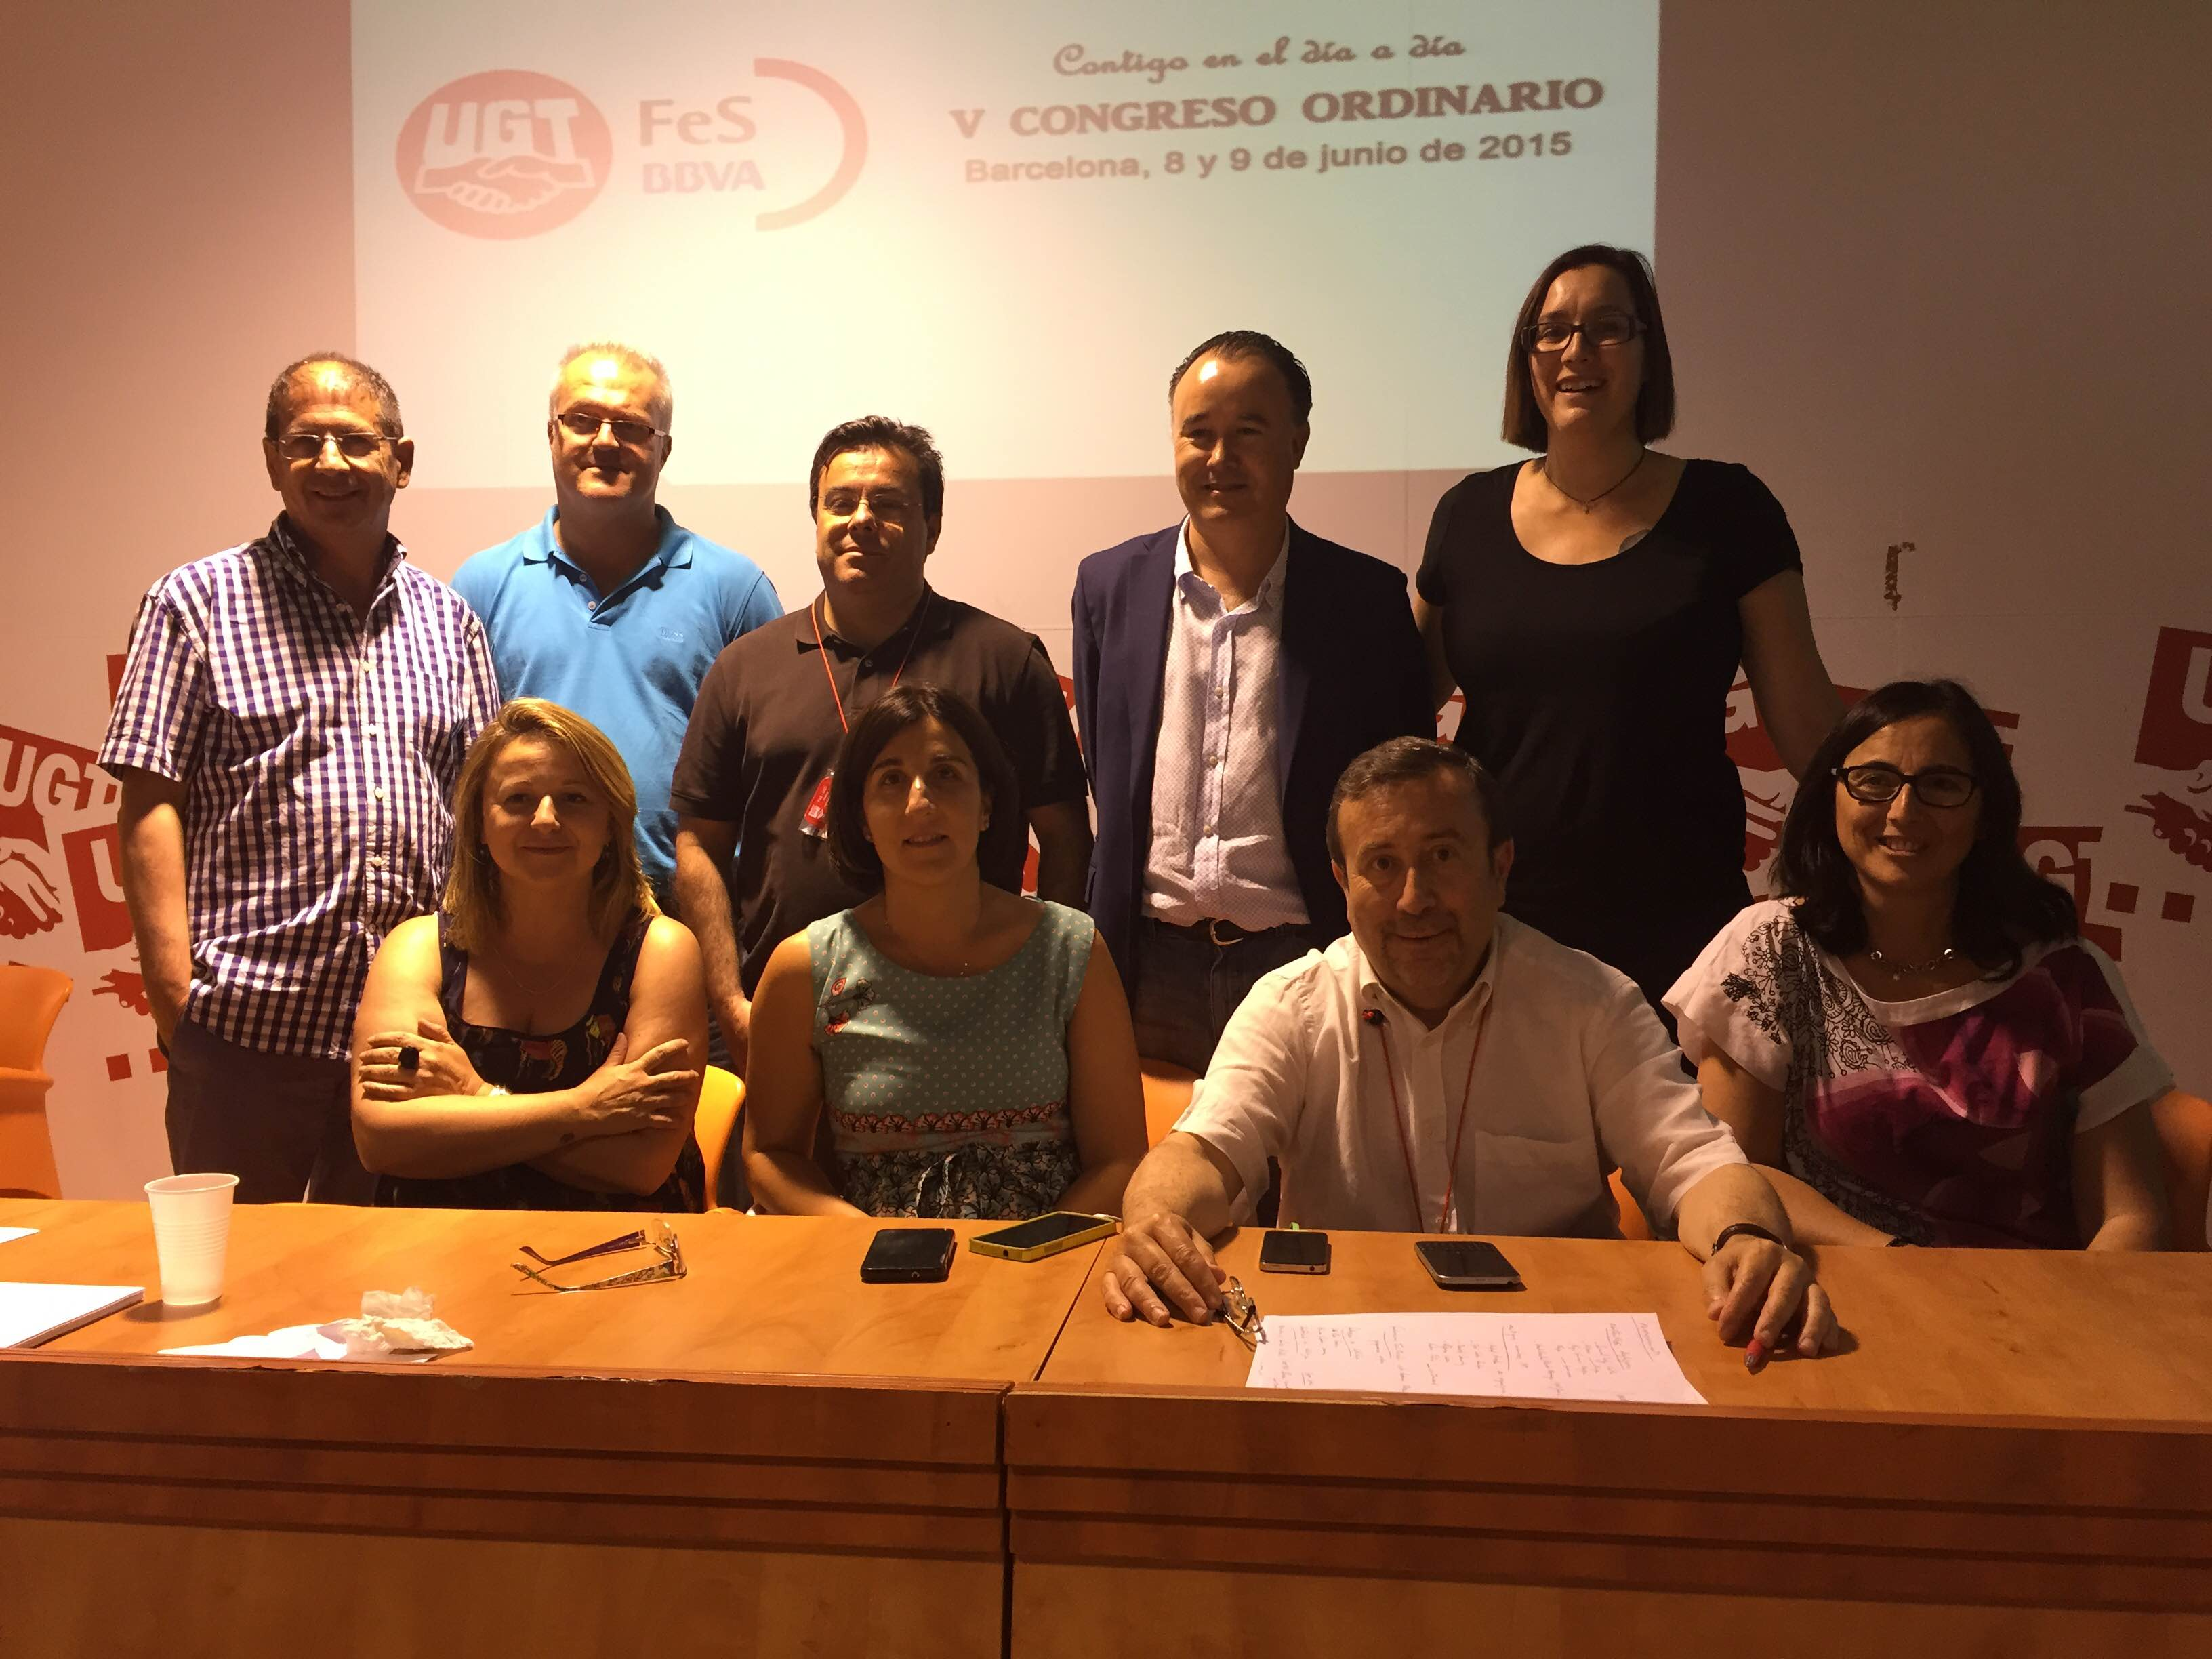 Ugt bbva ejecutiva estatal for Bbva oficines barcelona